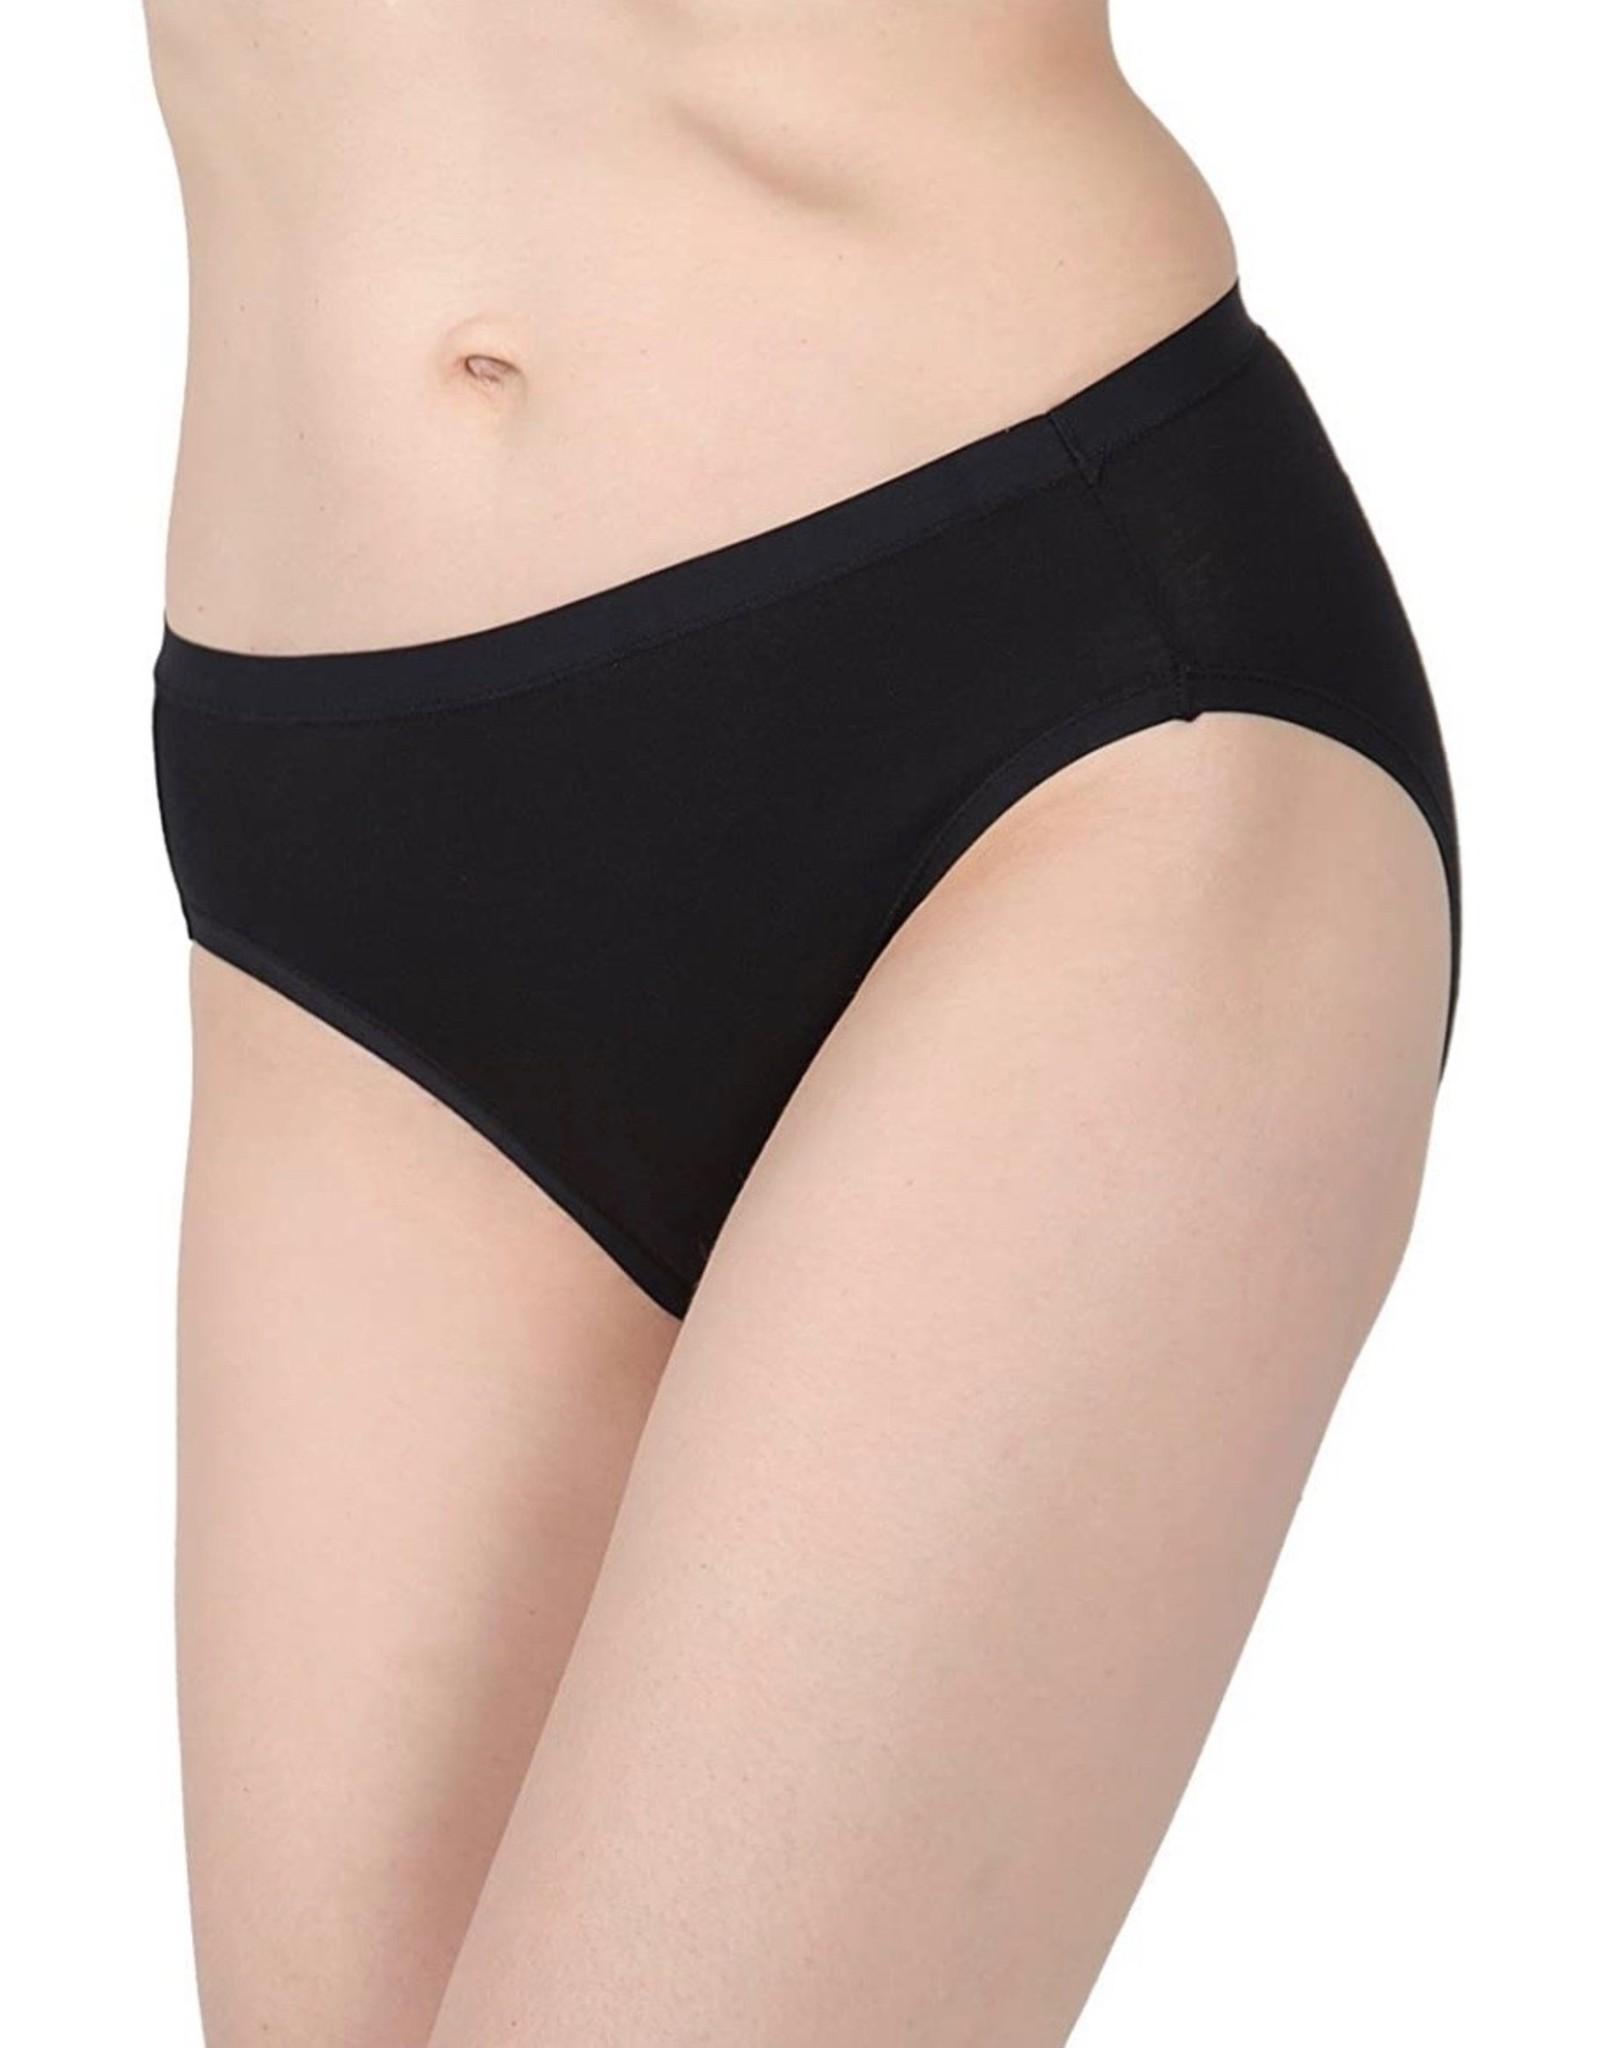 Memoi Memoi Ladies Hipster Underwear 3-Pack MU-1014